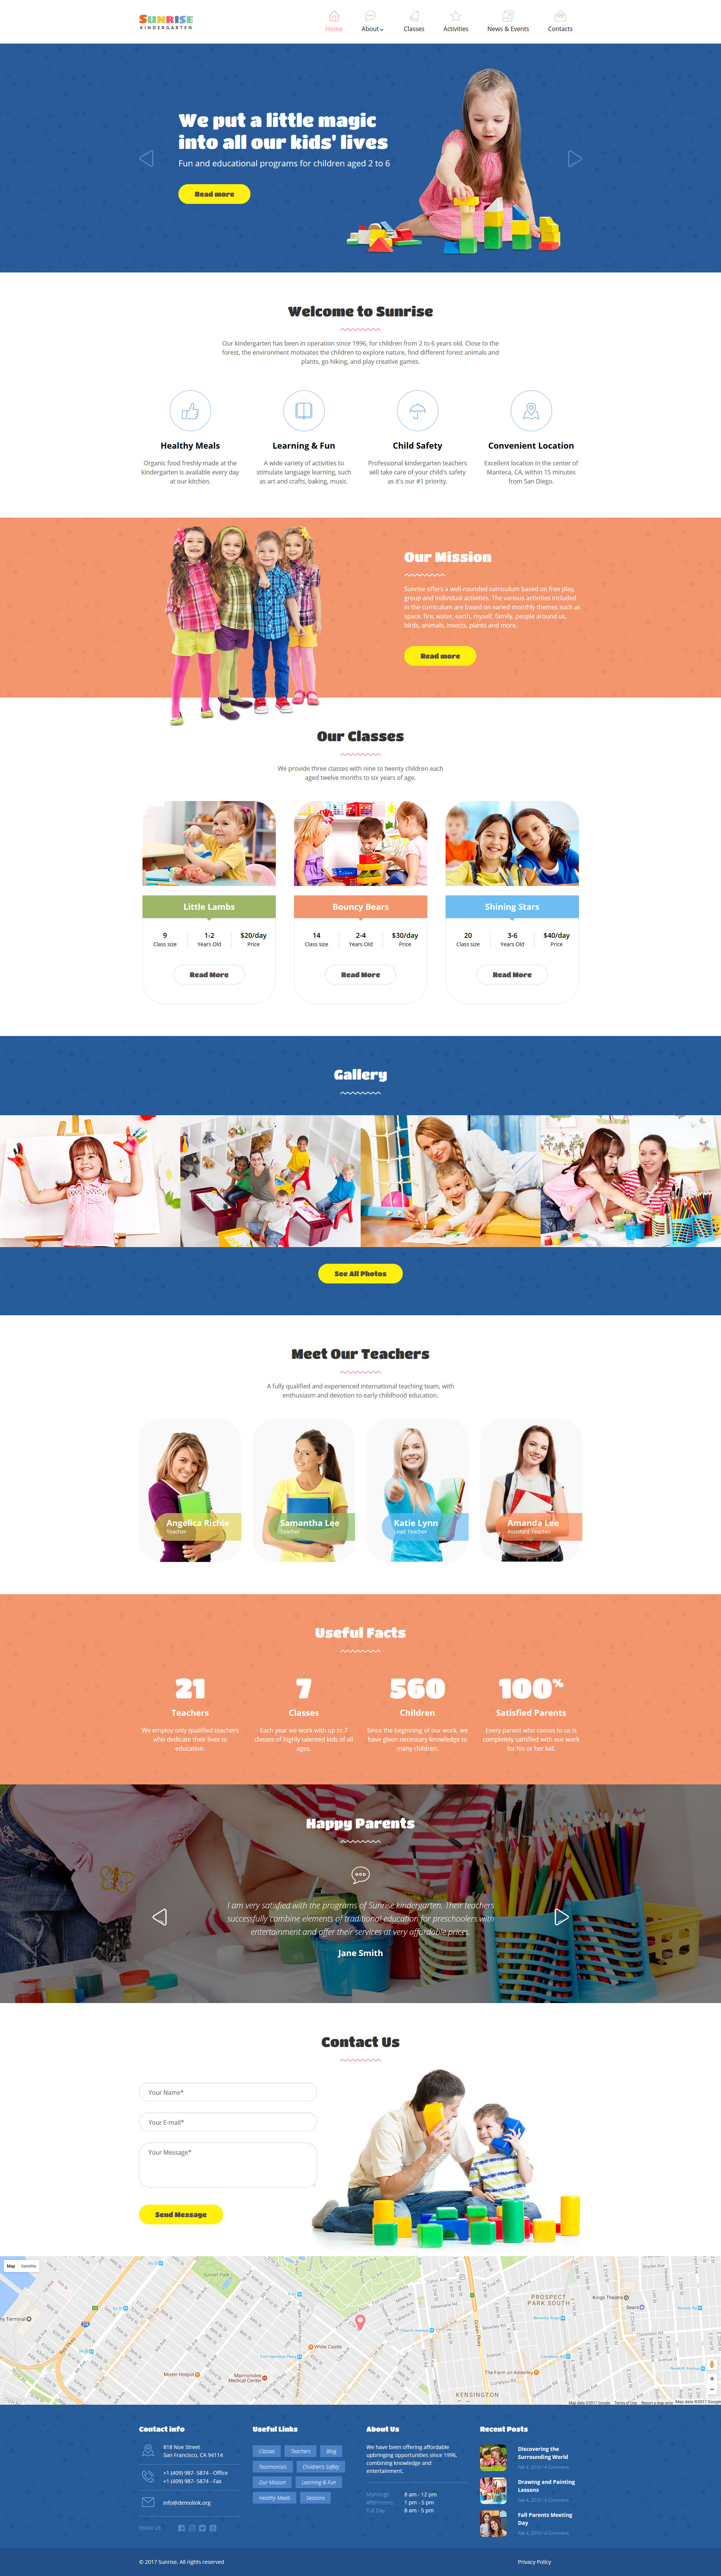 """Sunrise - Kids Center & Kindergarten Responsive"" - адаптивний Шаблон сайту №58894"